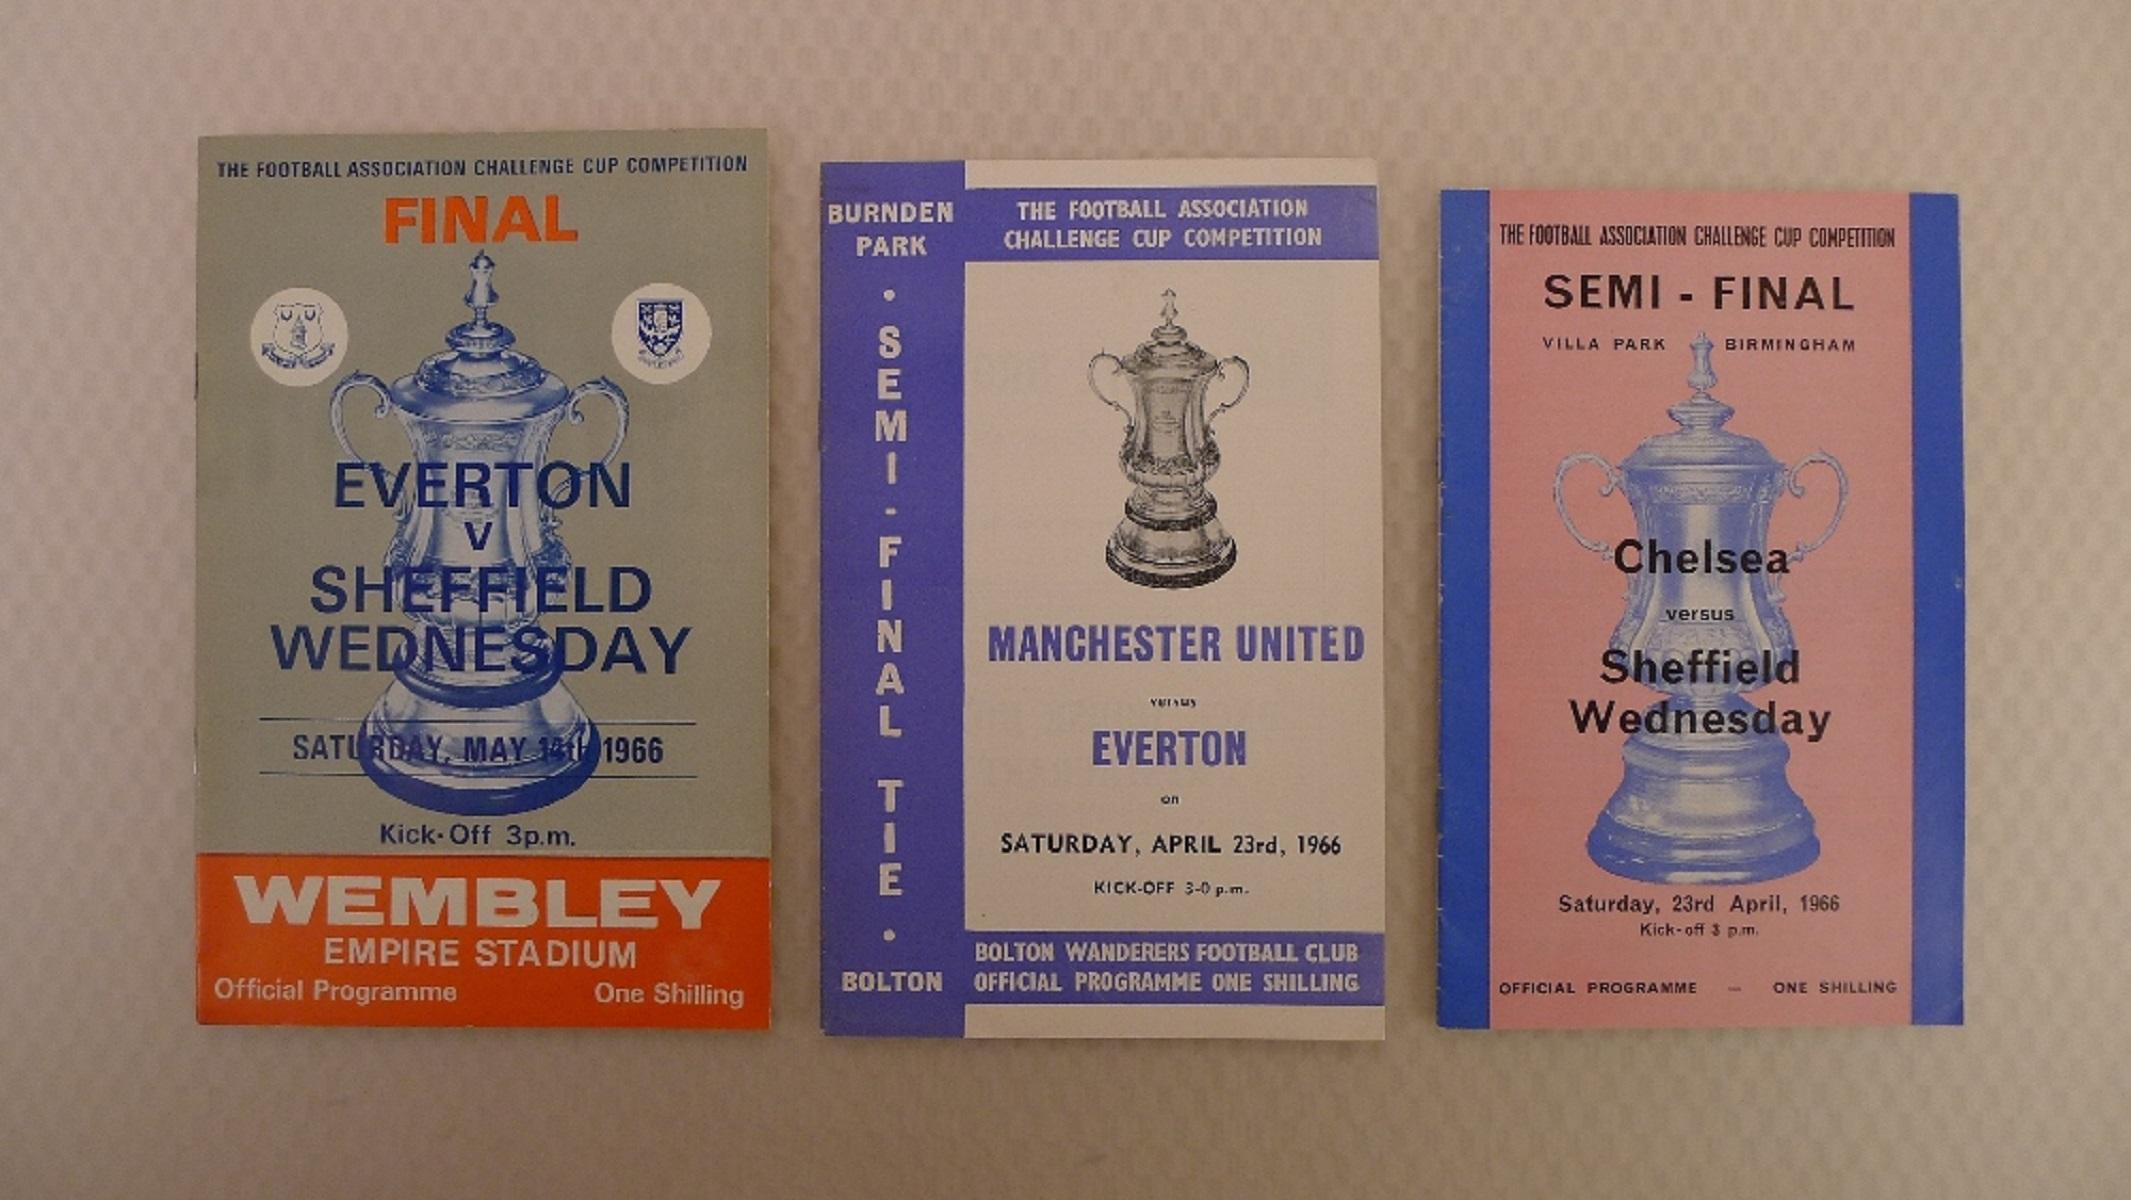 FA Cup football programmes 1966 1 x Final and 2 x Semi Final football programmes comprising Final